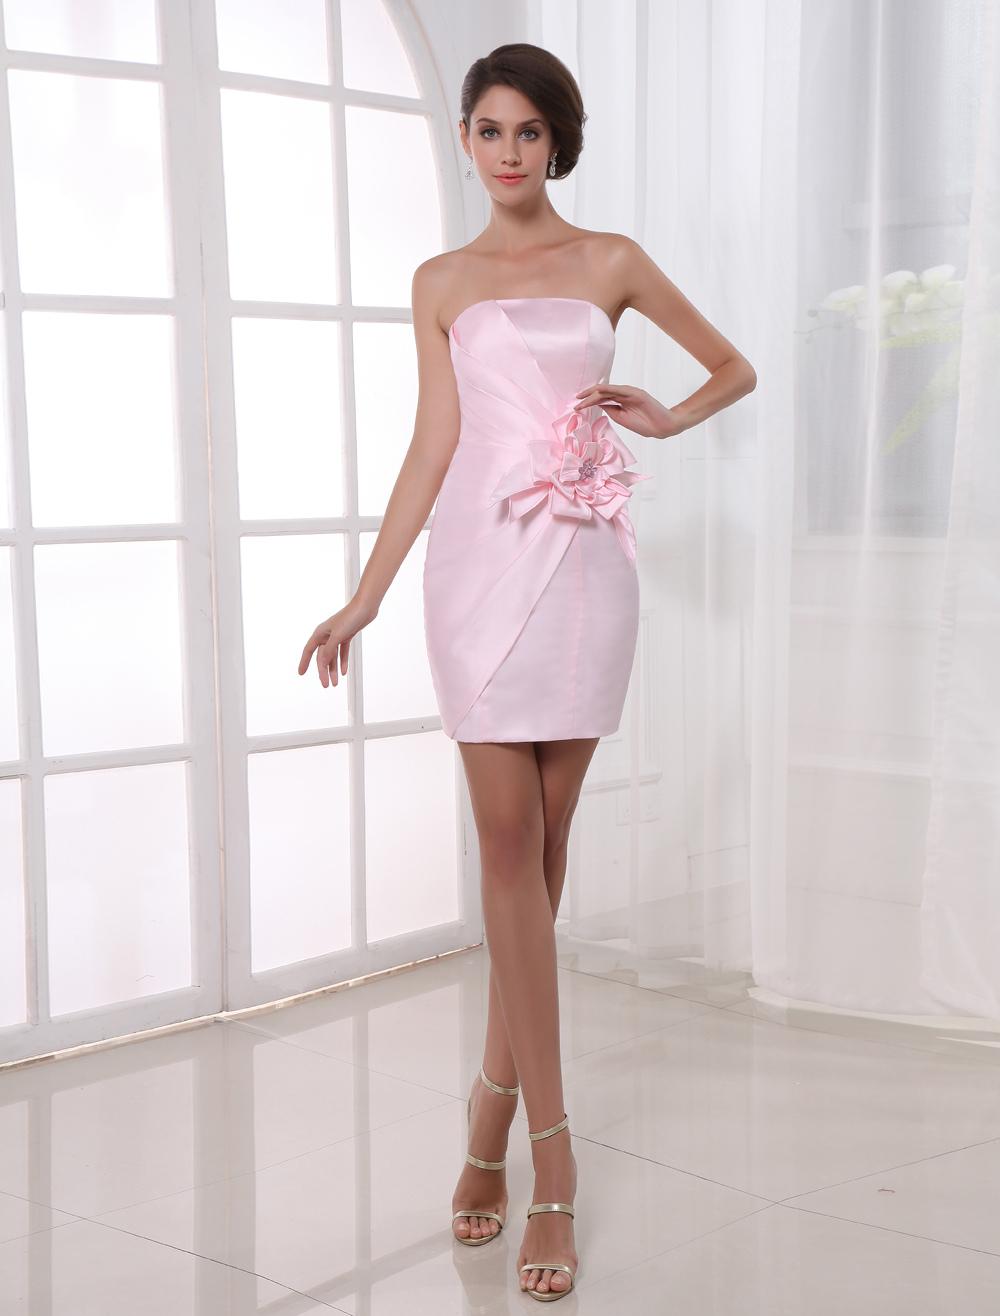 Sheath Pink Satin Floral Strapless Short Cocktail Dress For Women